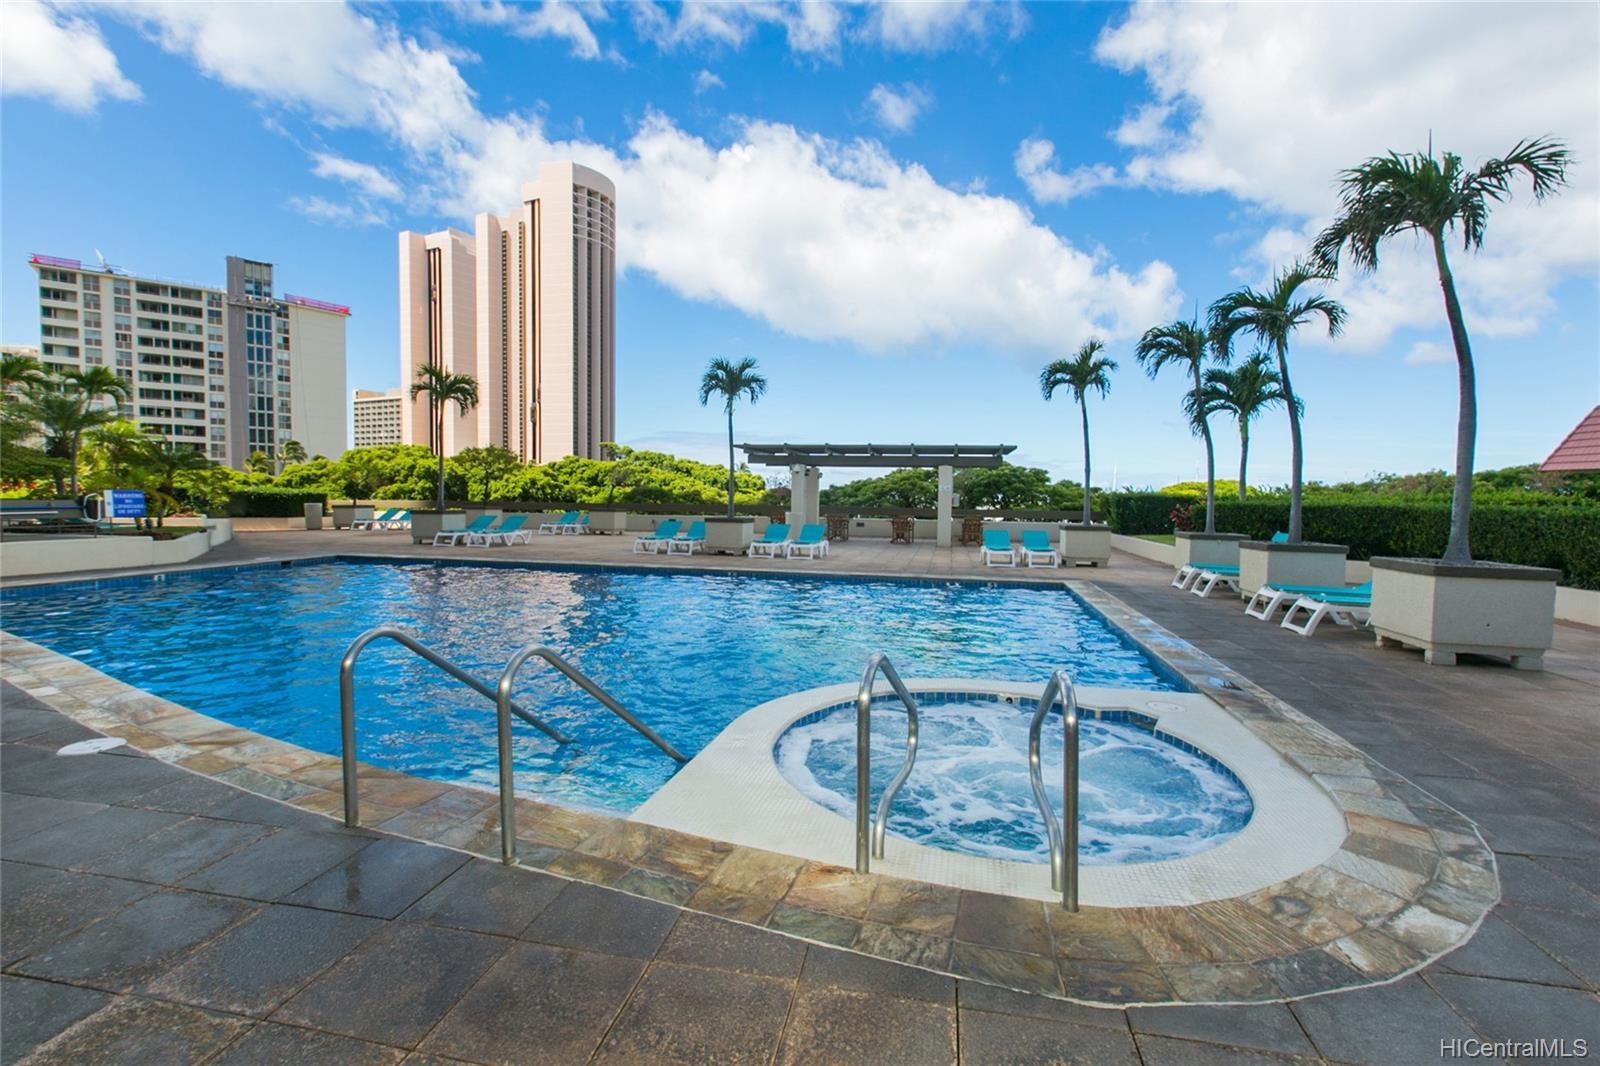 1600 Ala Moana Blvd Honolulu - Rental - photo 21 of 25